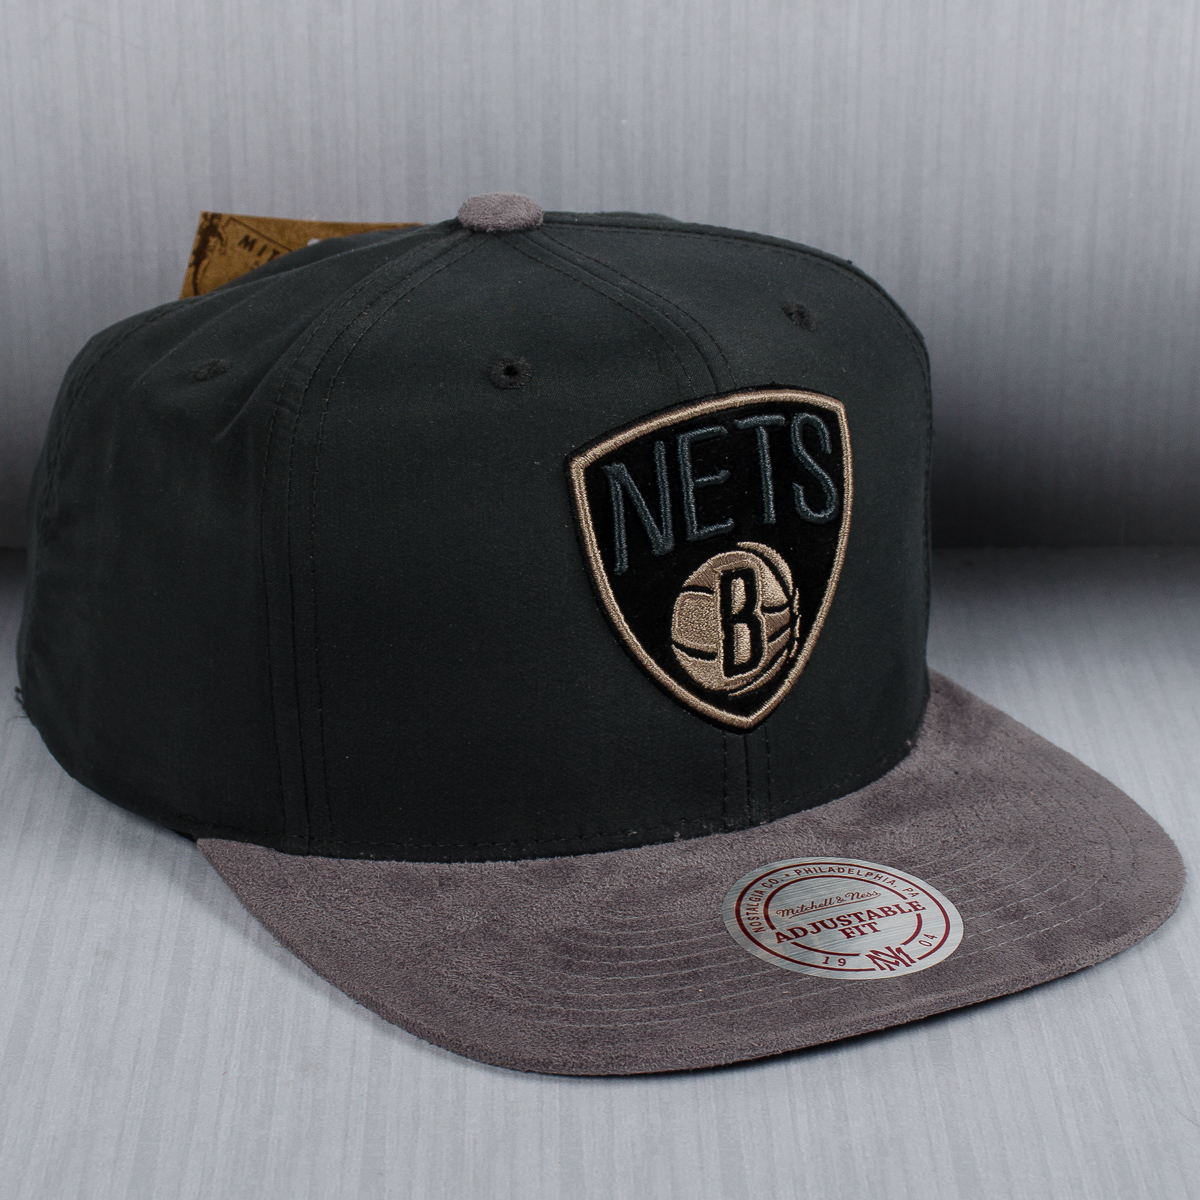 f696a1a50ee Mitchell   Ness NBA Brooklyn Nets Buttery Snapback Cap - NBA Shop Brooklyn  Nets Merchandise - Superfanas.lt